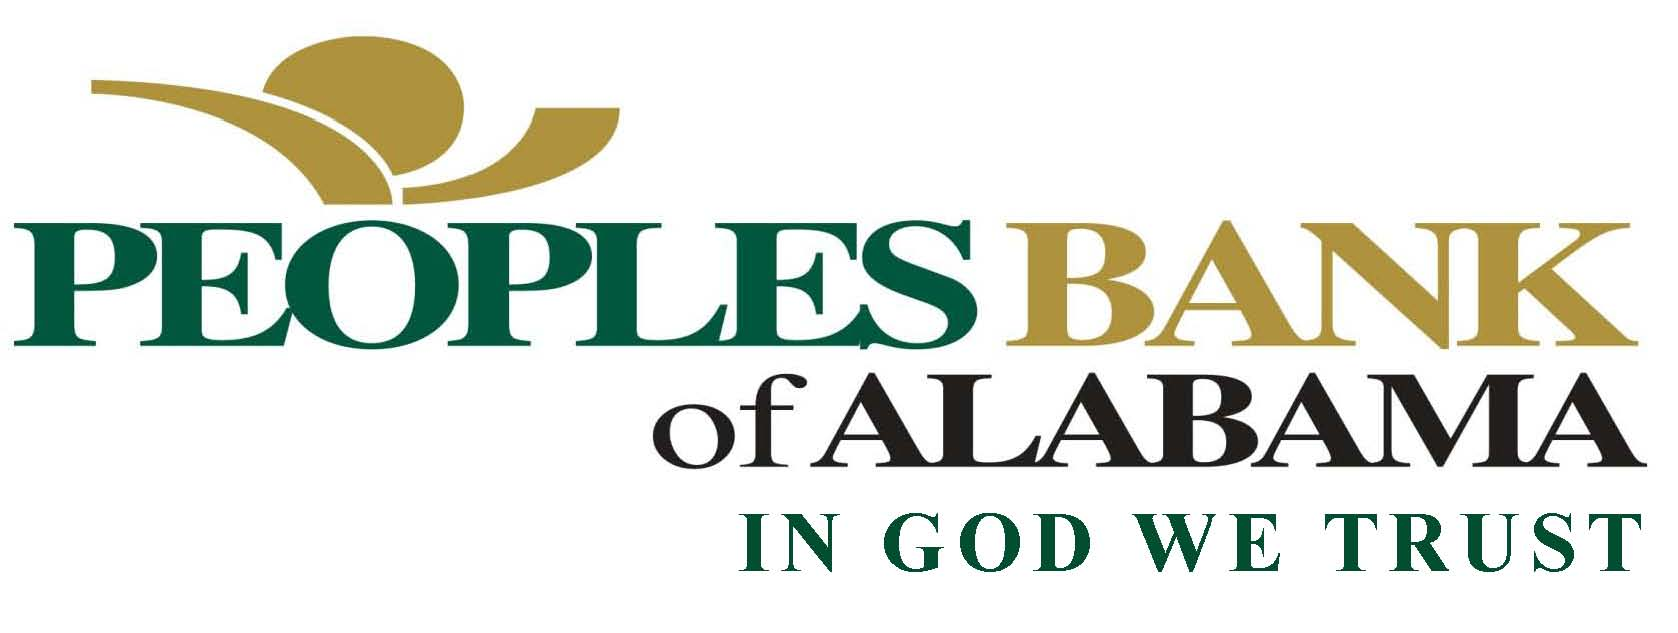 Peoples Bank of Alabama